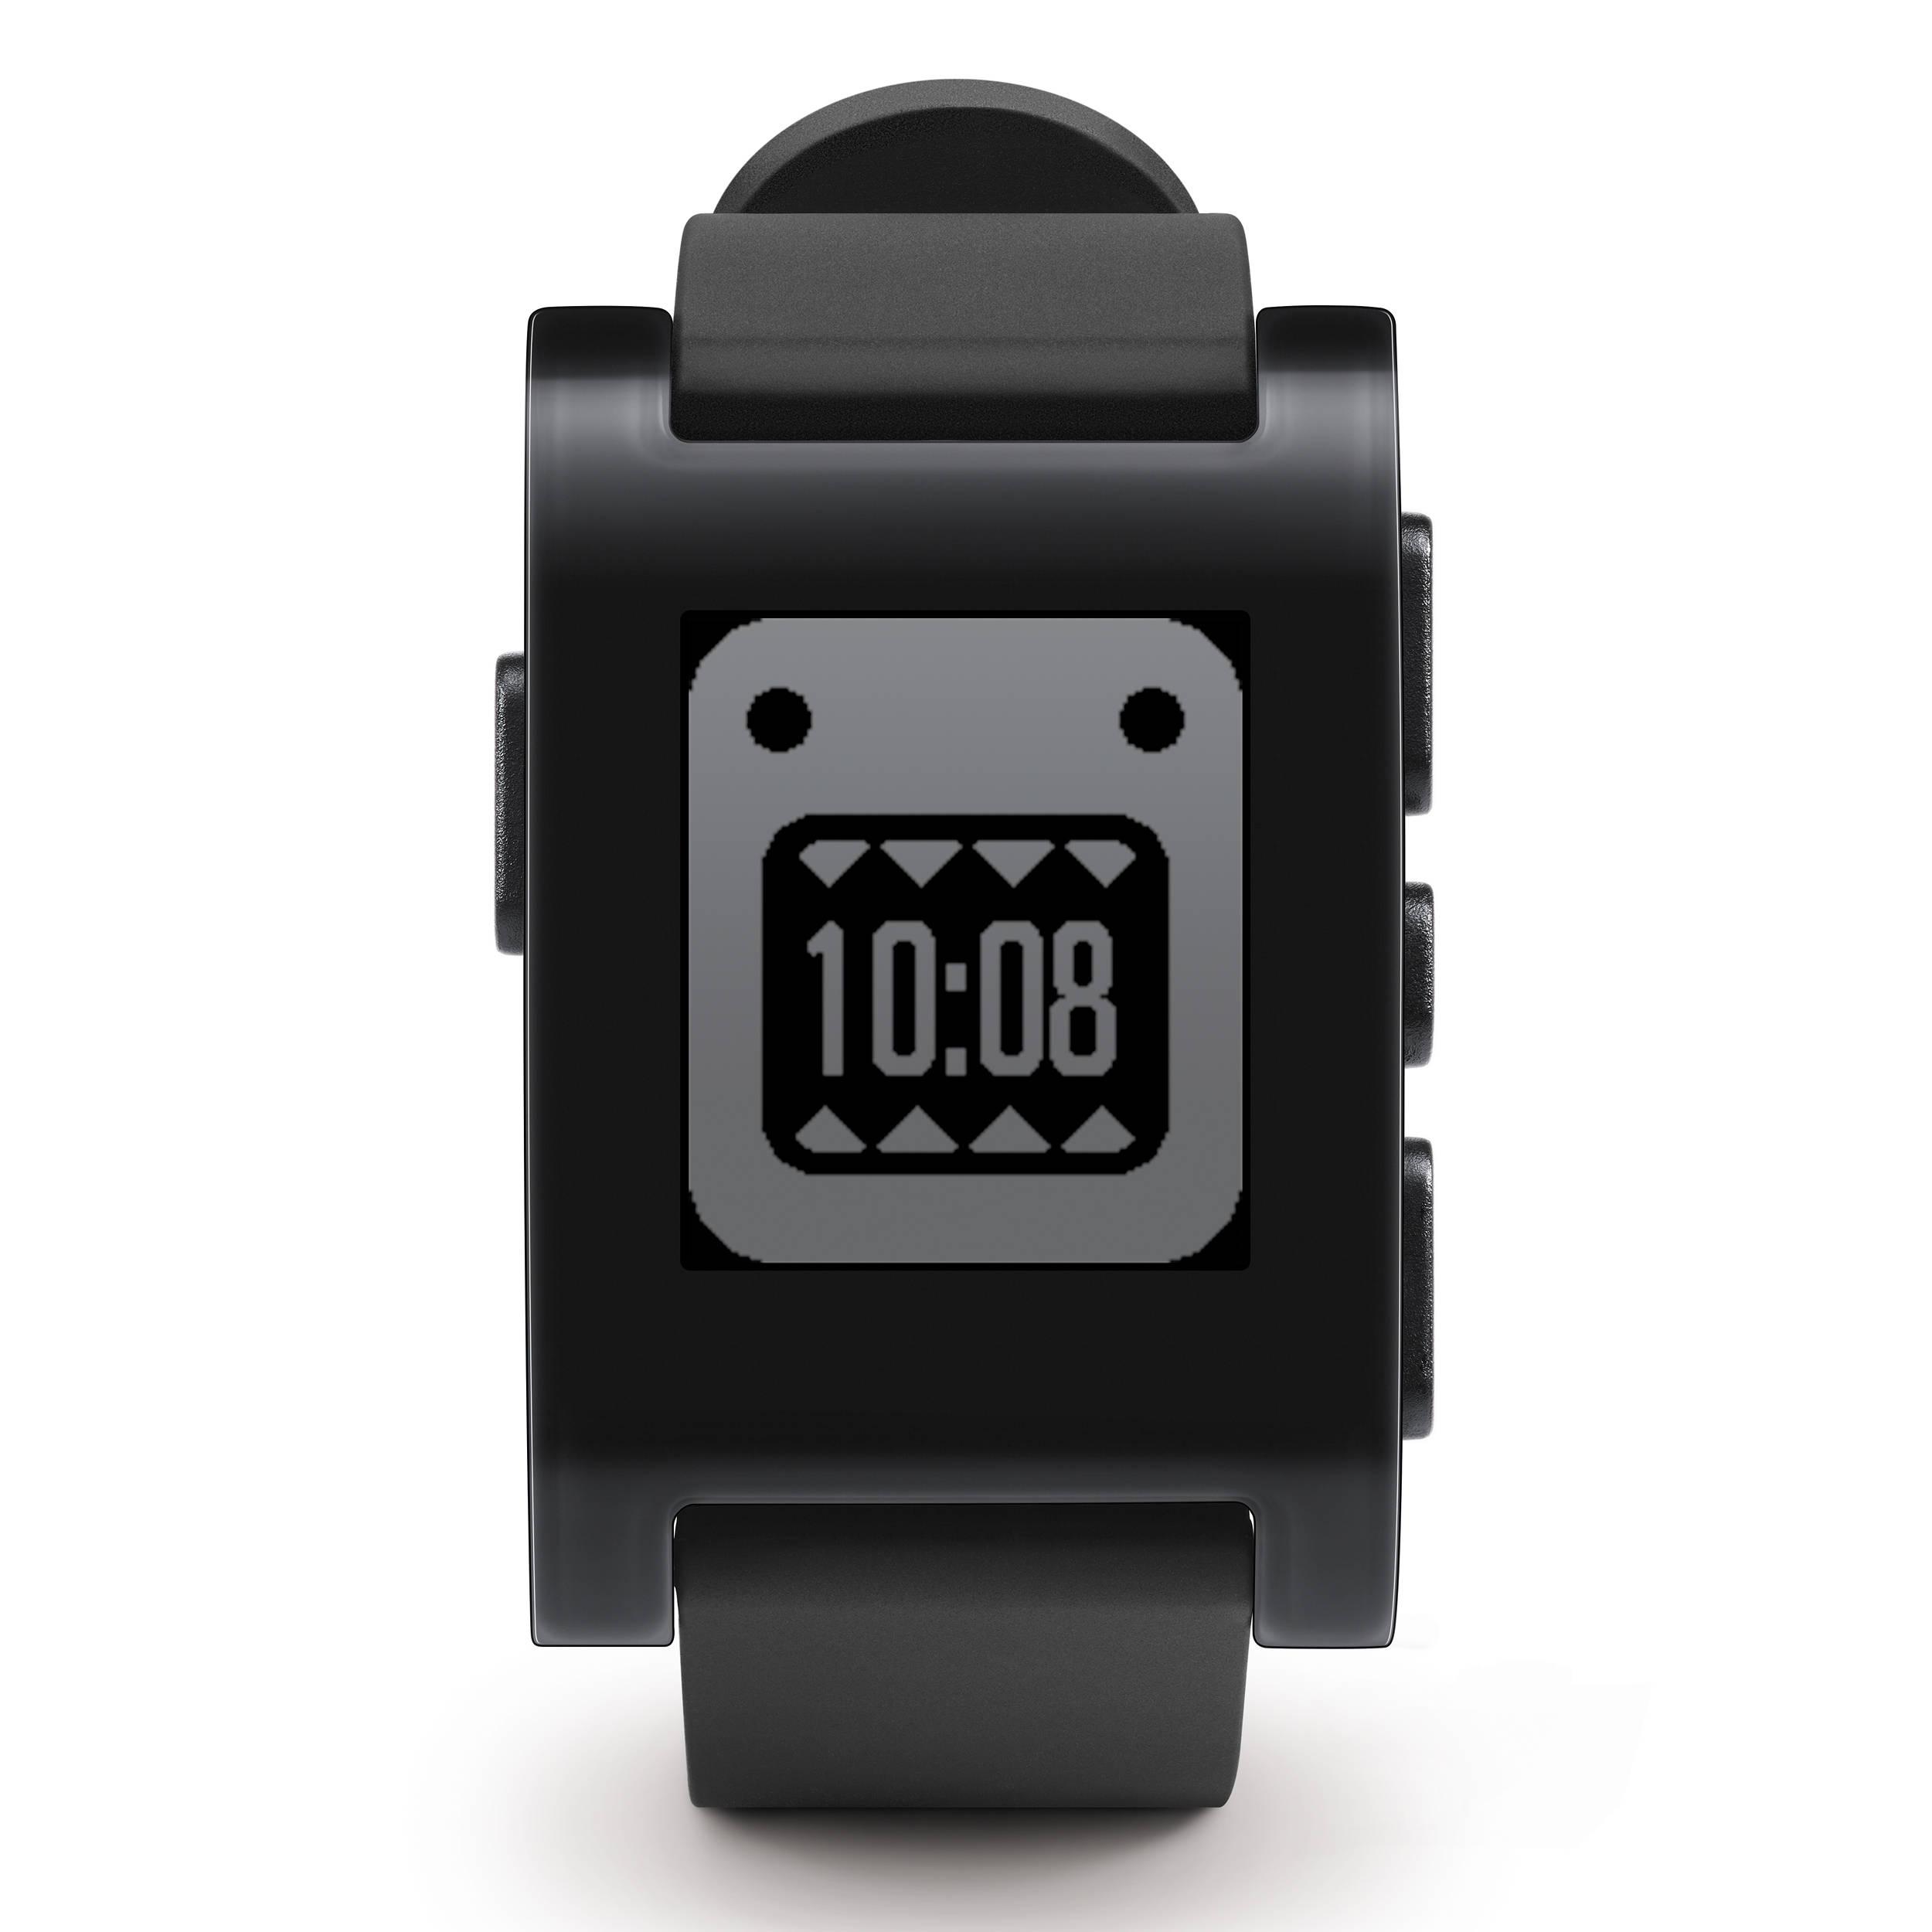 Pebble Smartwatch (Jet Black, TPU Rubber Band) 301BL B&H Photo